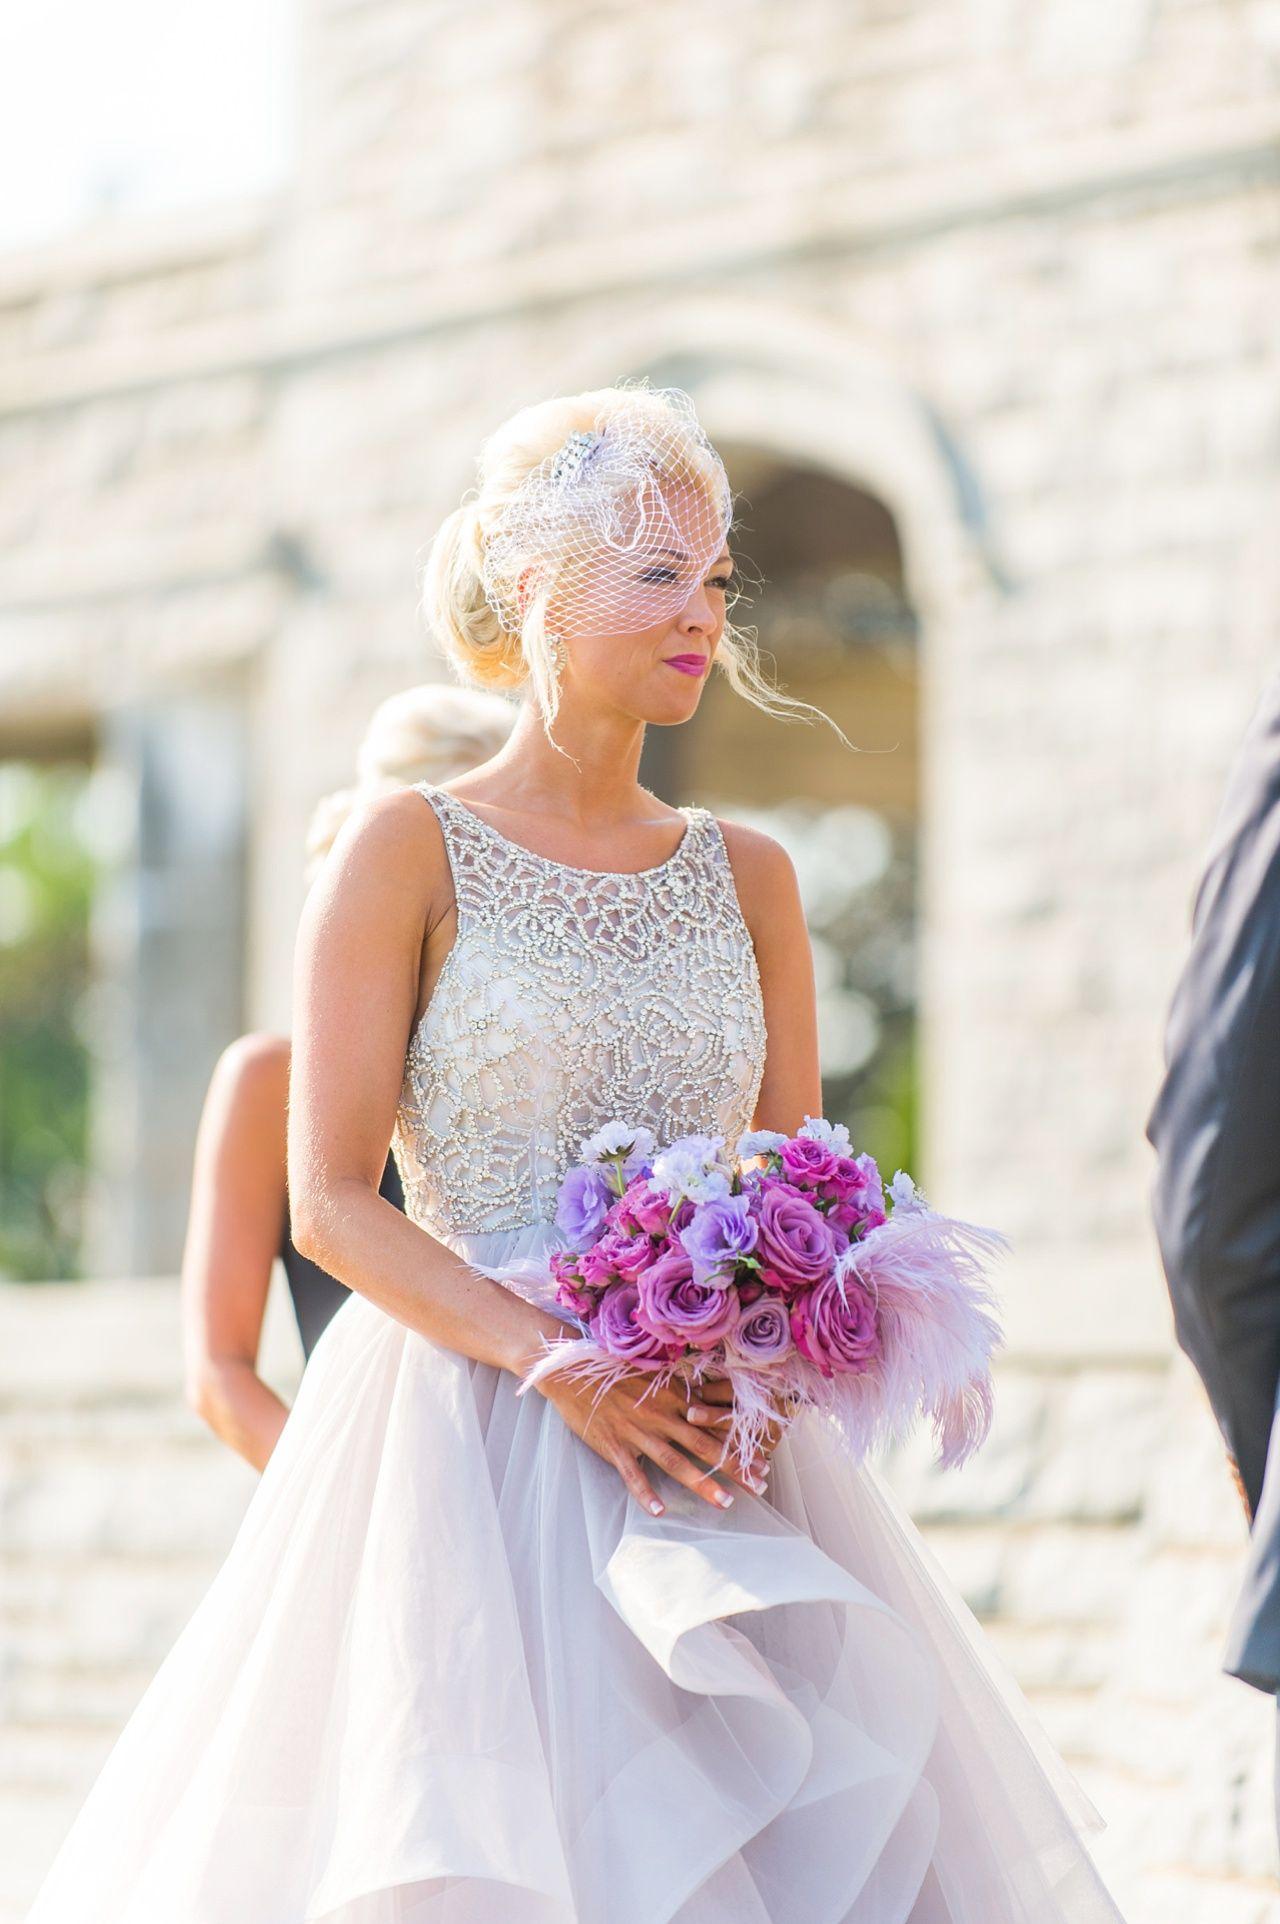 Hayley paige dori wedding dress  Branford House Wedding captured by Justin u Mary with hair by Dana